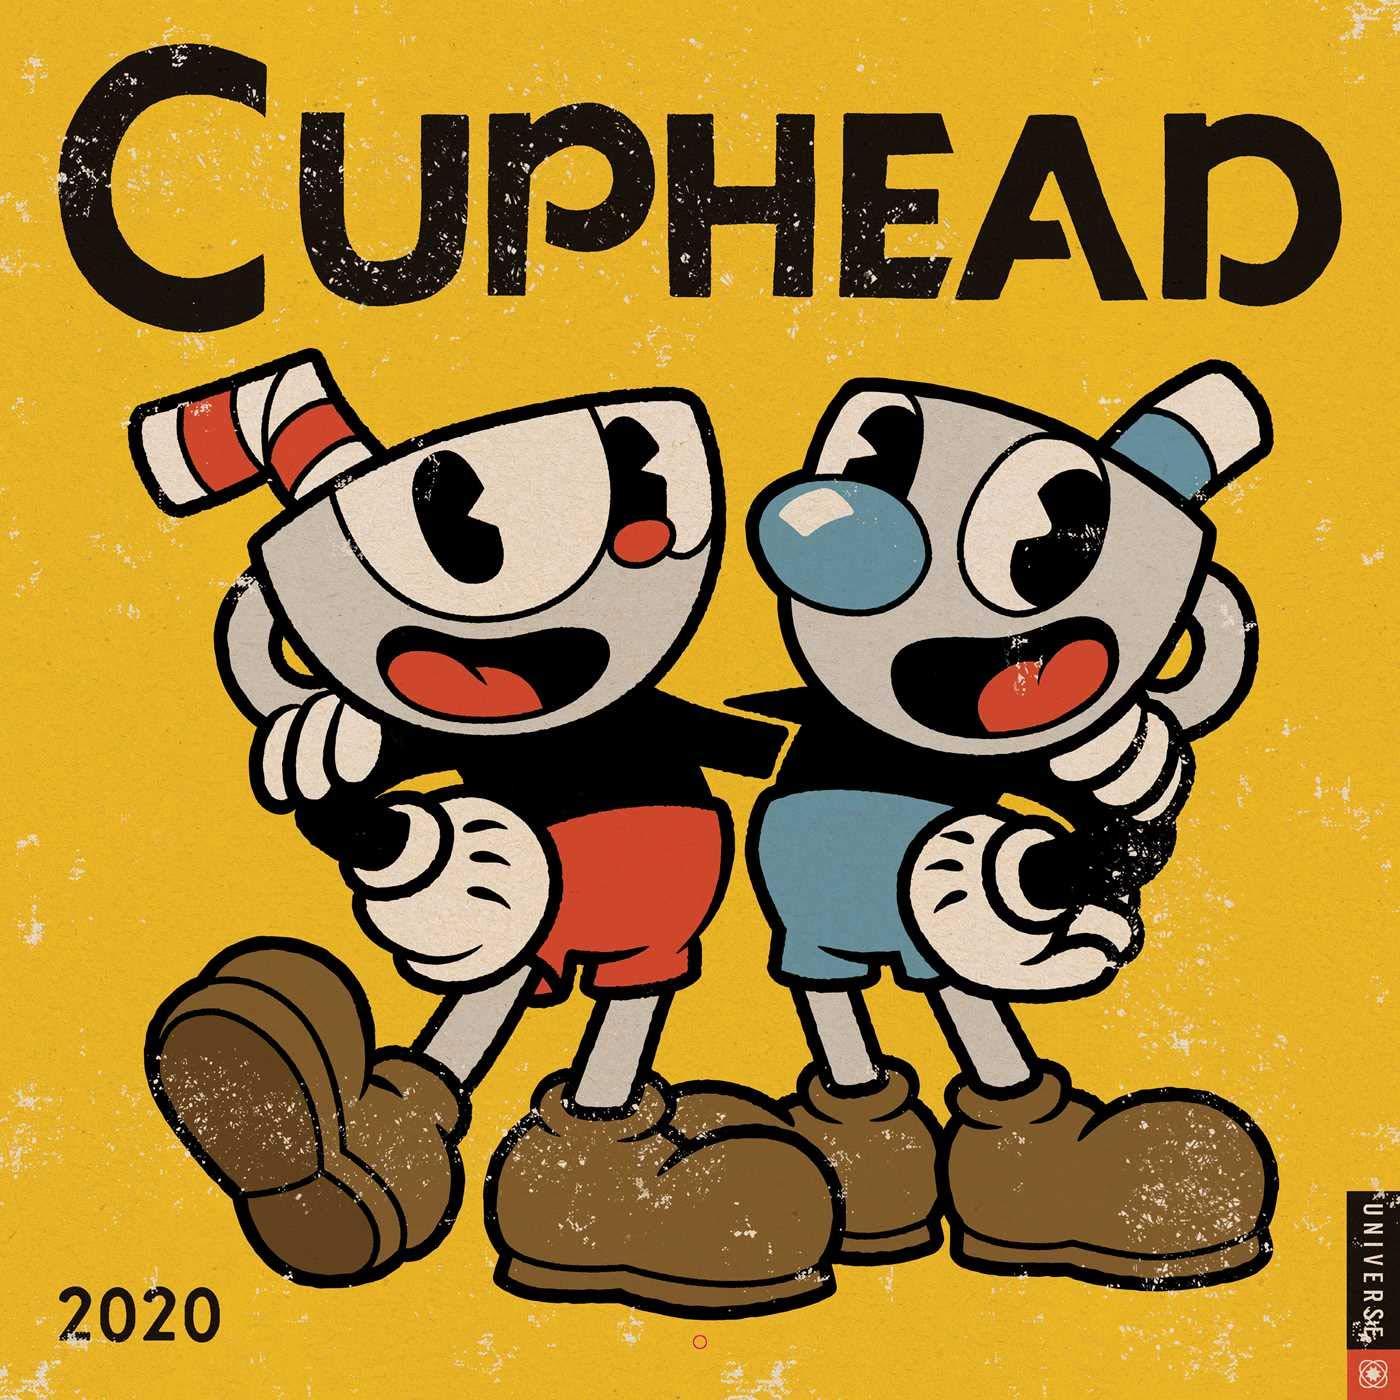 Amazon | Cuphead 2020 Wall Cal...